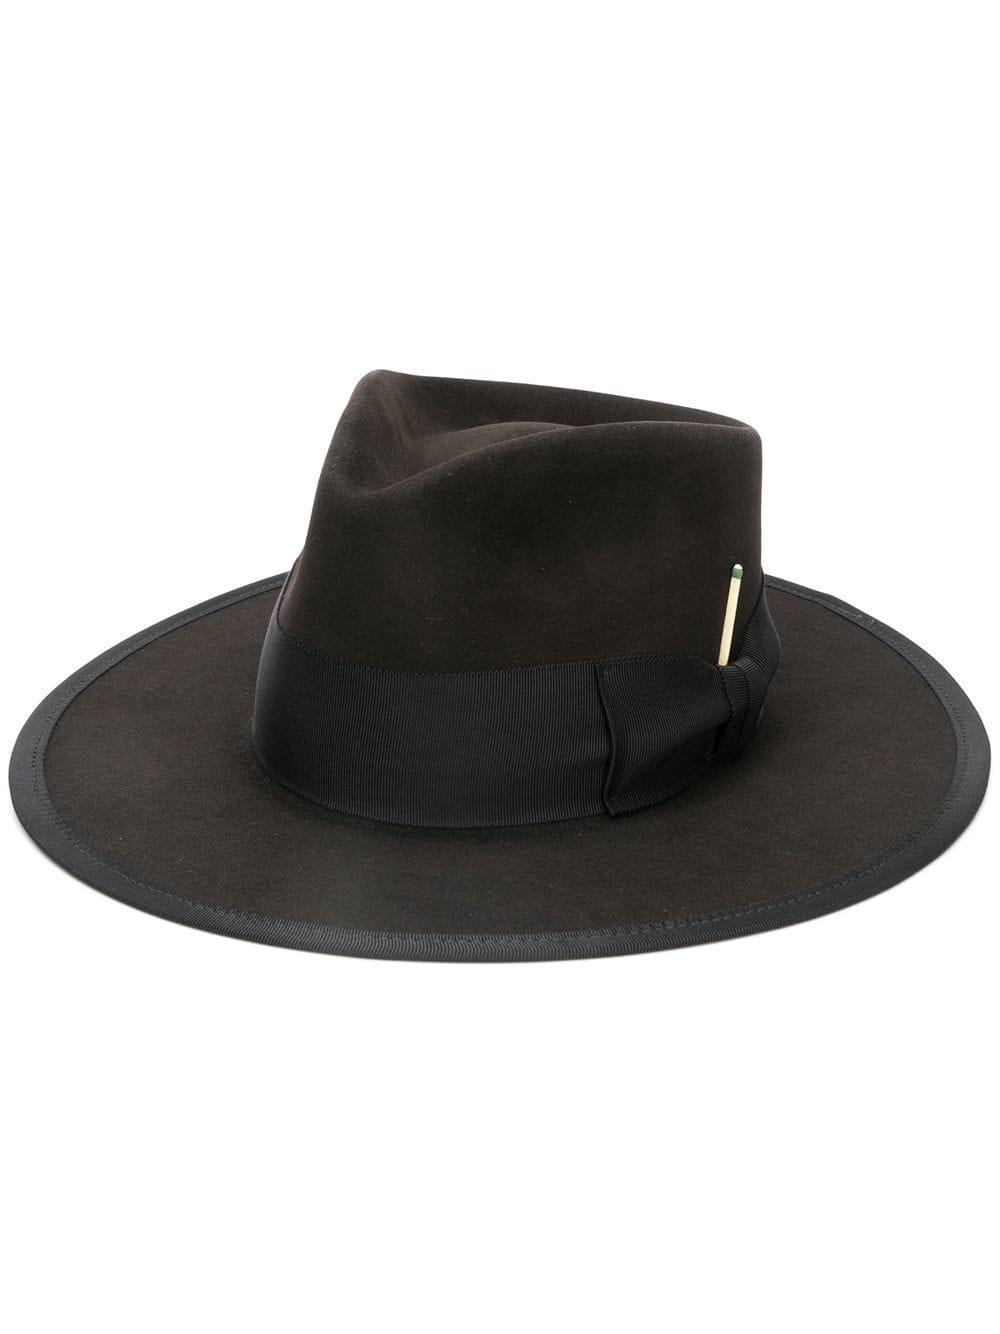 20d60f25e3997 Nick Fouquet Ribbon Fedora Hat - Black